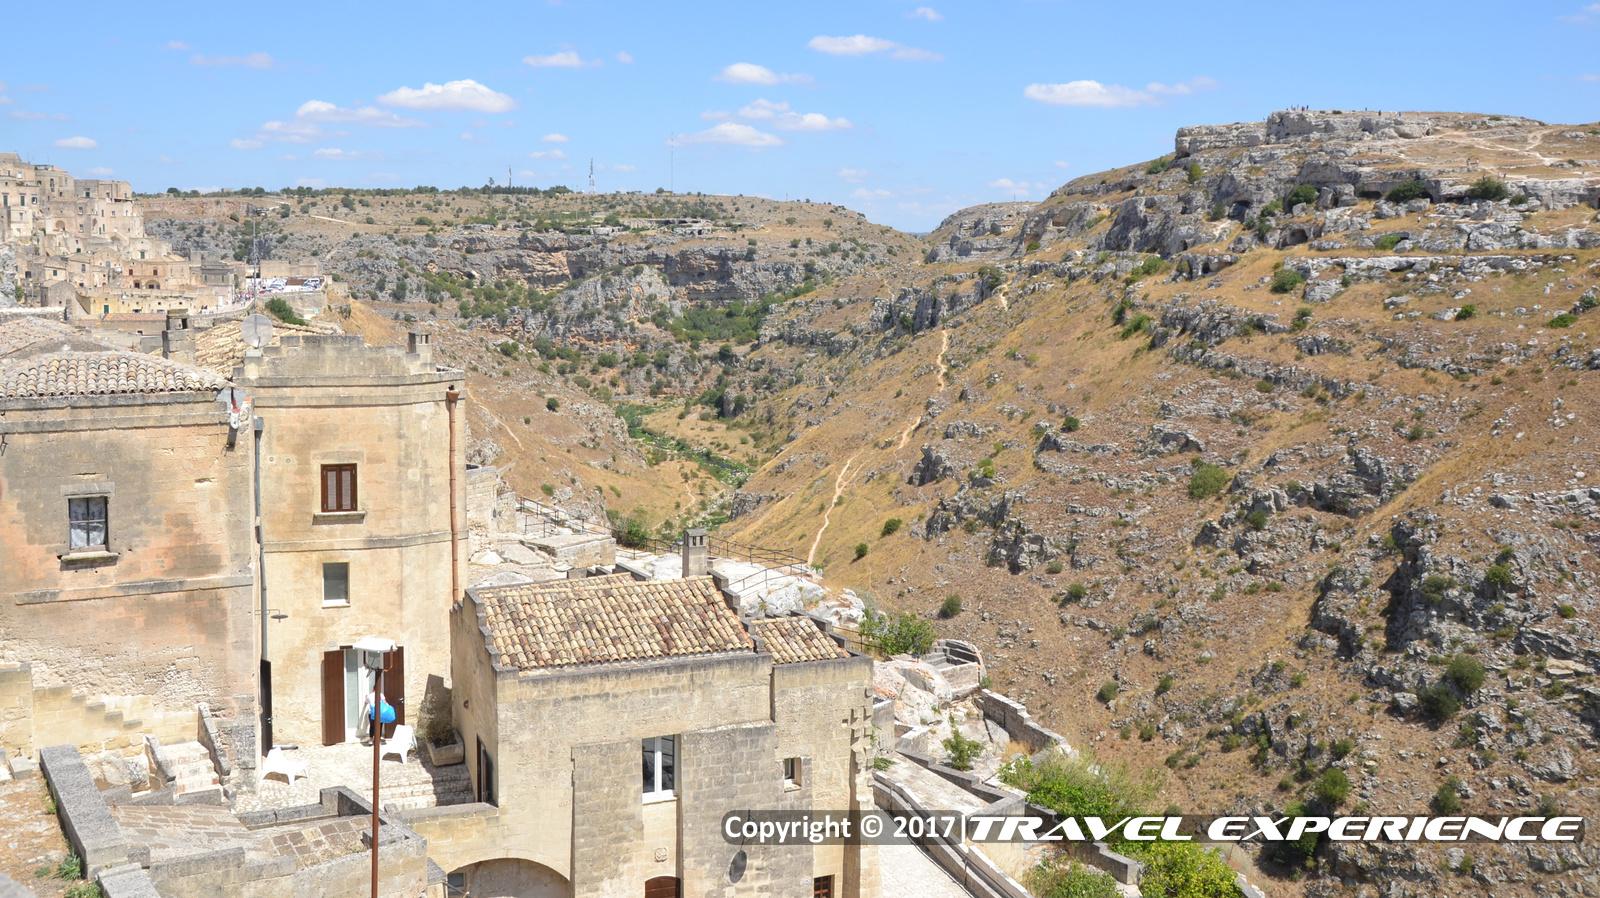 foto panorama dei calanchi a Matera